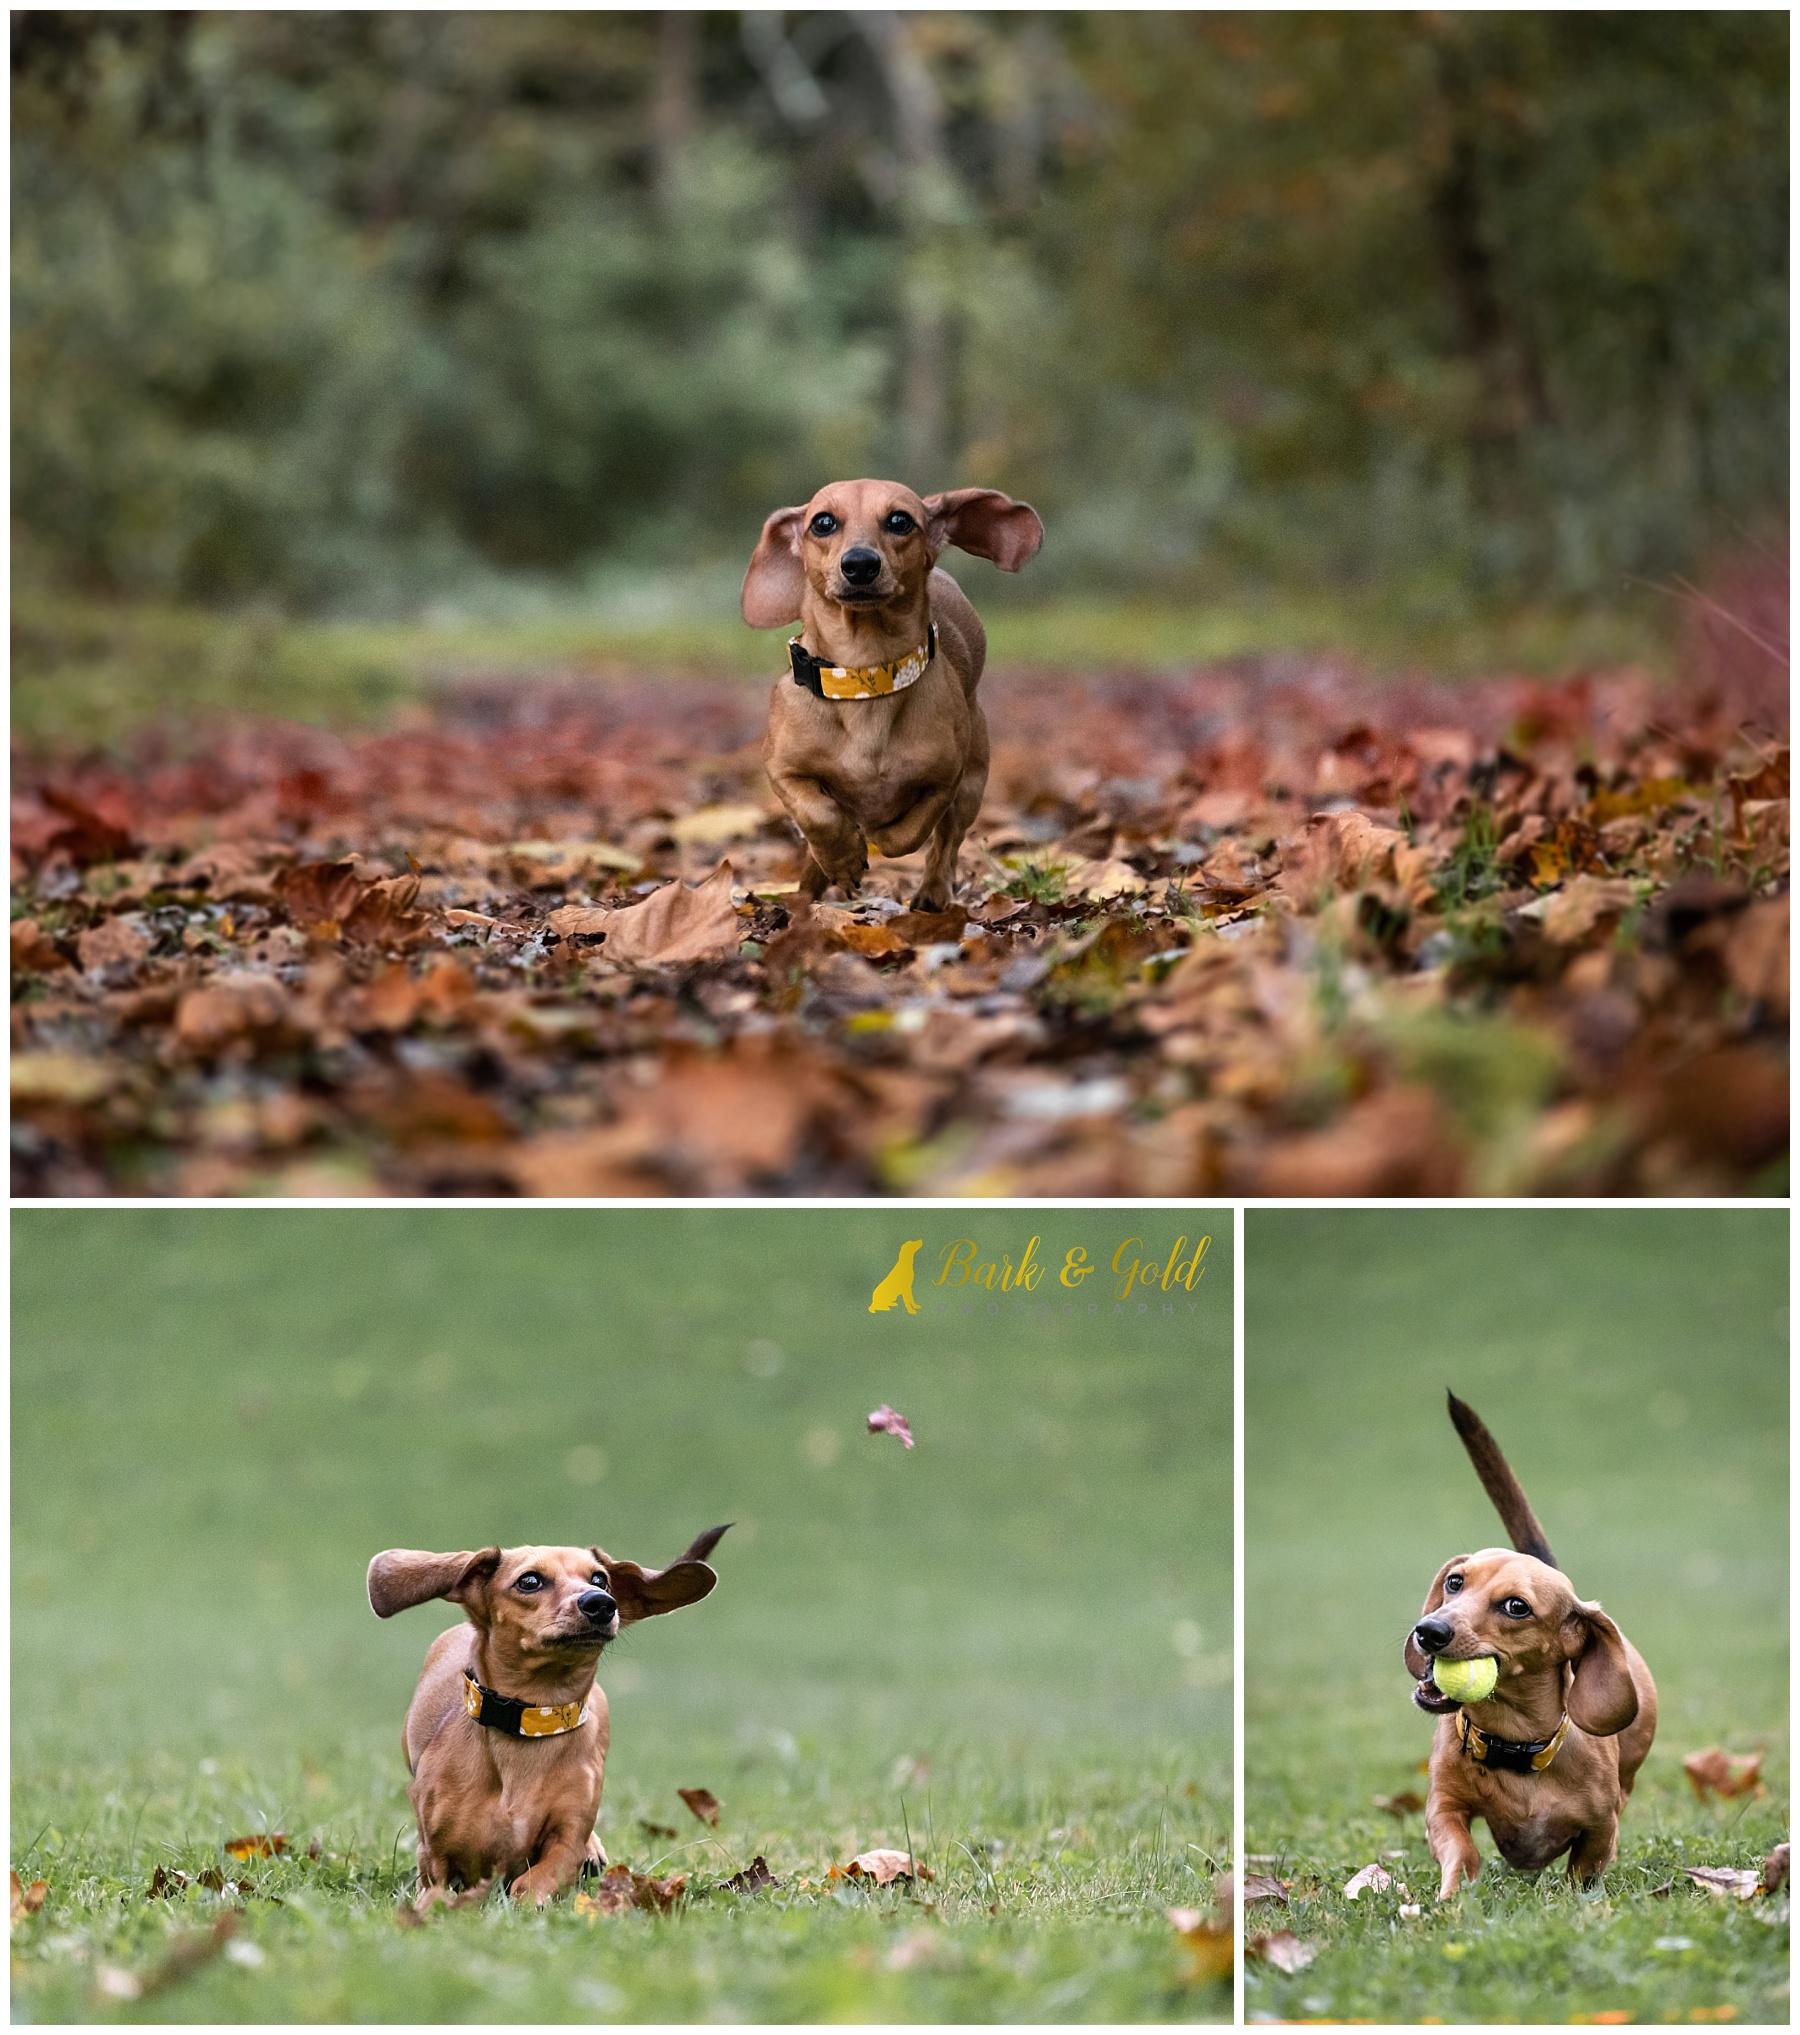 dachshund puppy running through leaves in Brady's Run Park in Beaver County